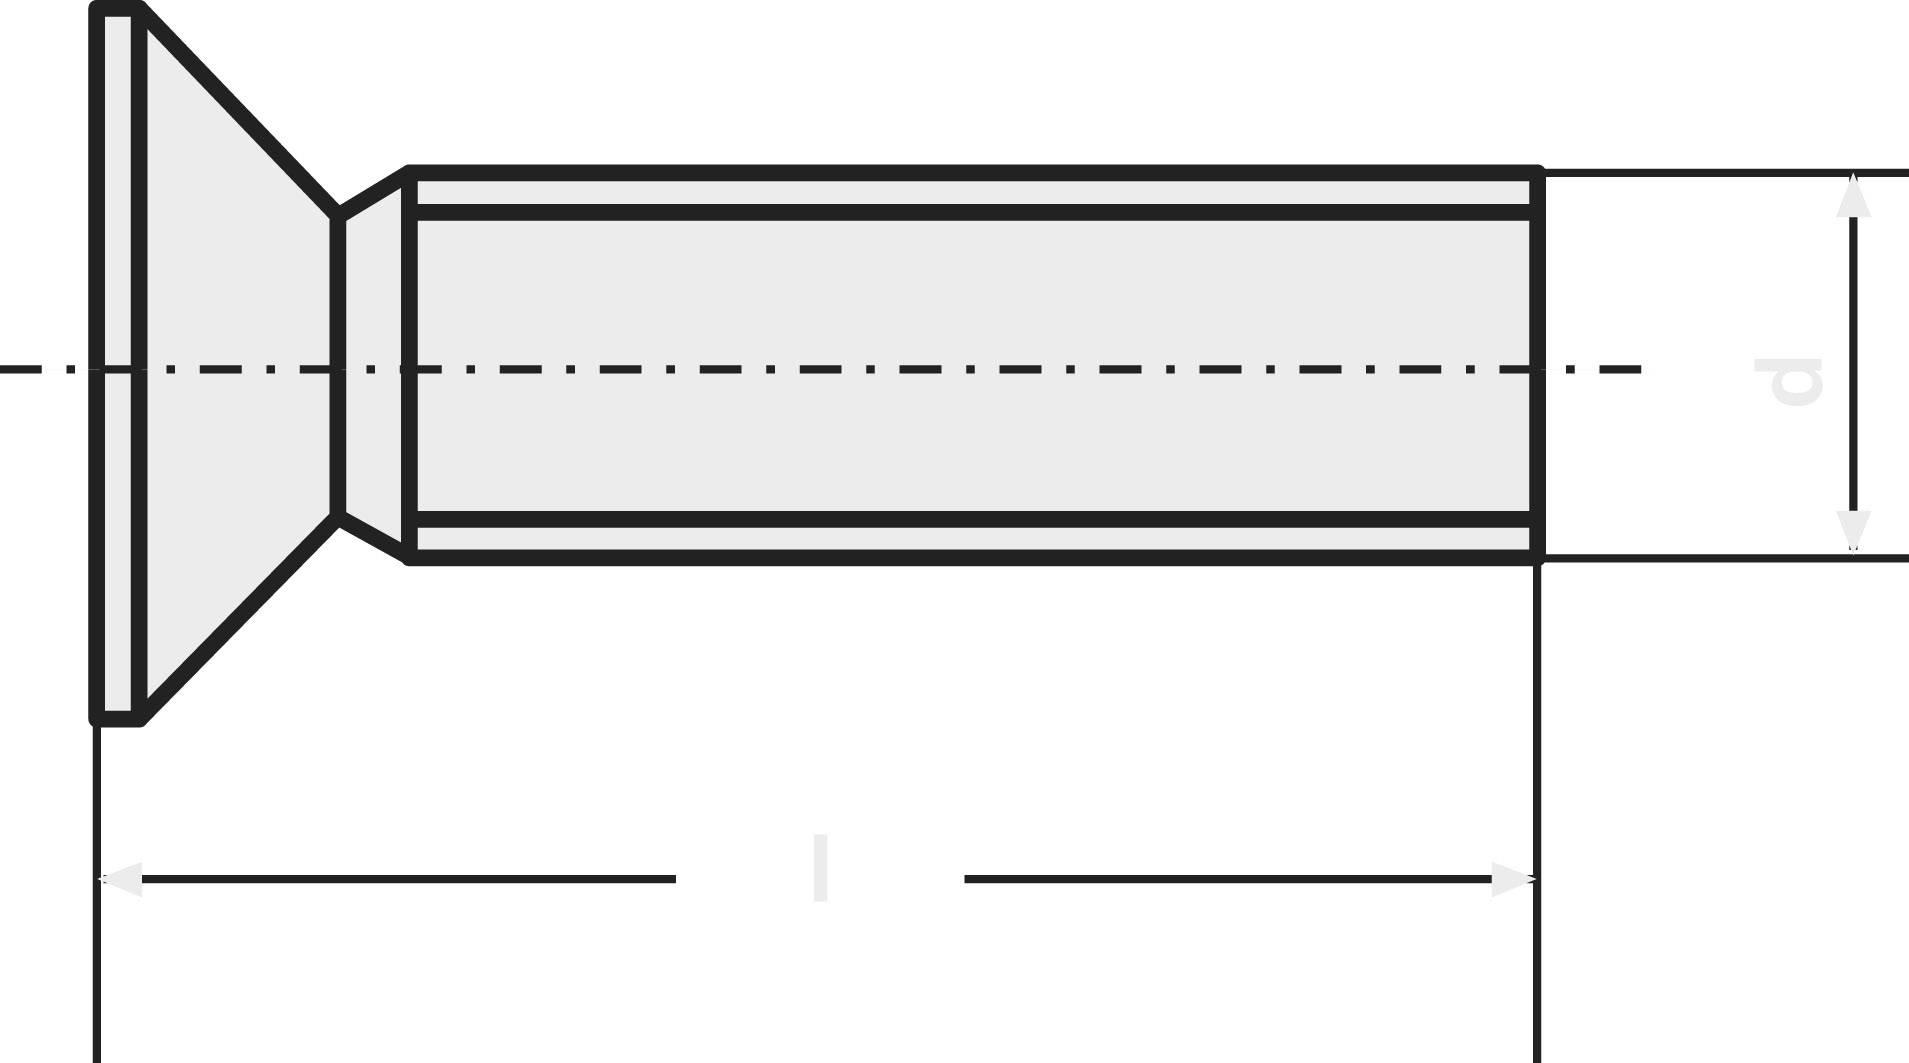 20 mm lange Anschlussdrähte 25 St. Miniatur-Glühlämpchen ////  gelb 3V  50mA